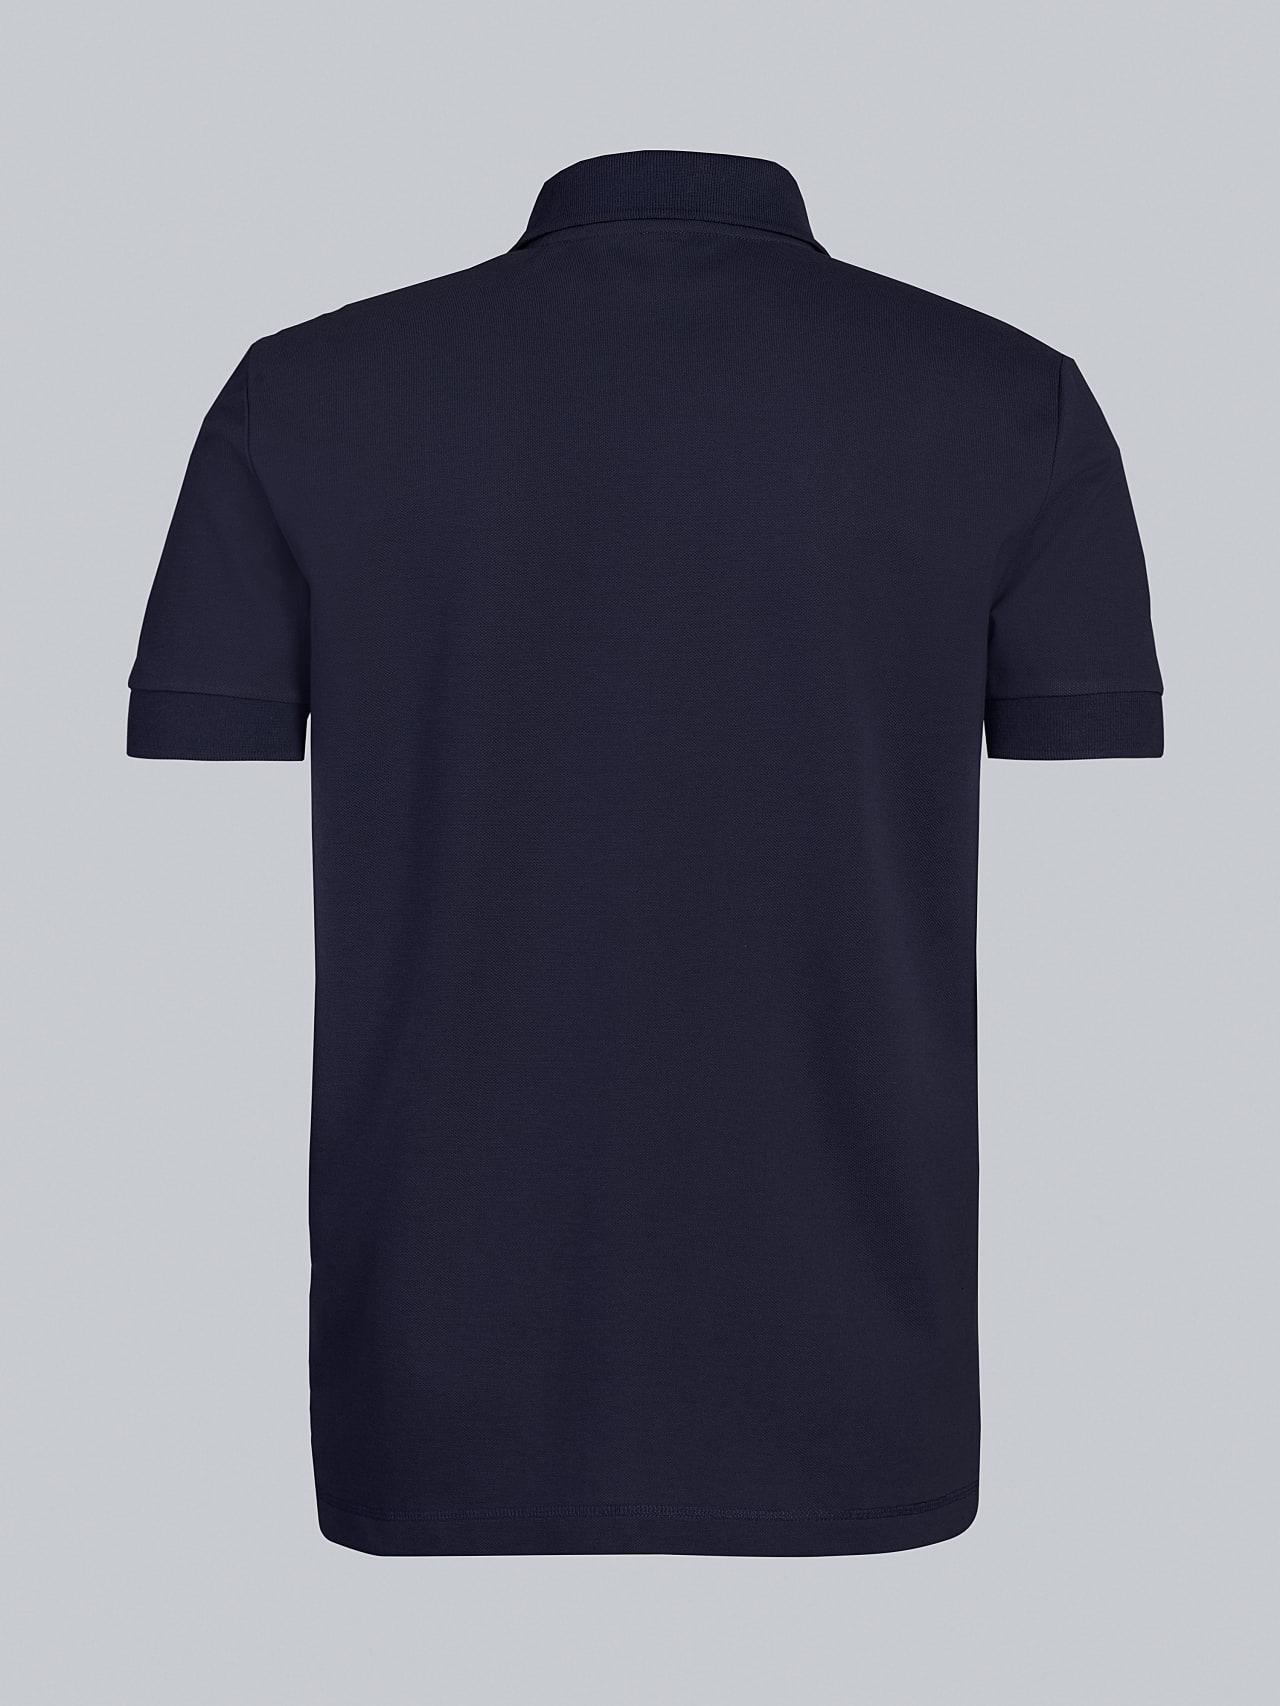 JANX V5.Y5.02 Pique Polo Shirt navy Left Alpha Tauri